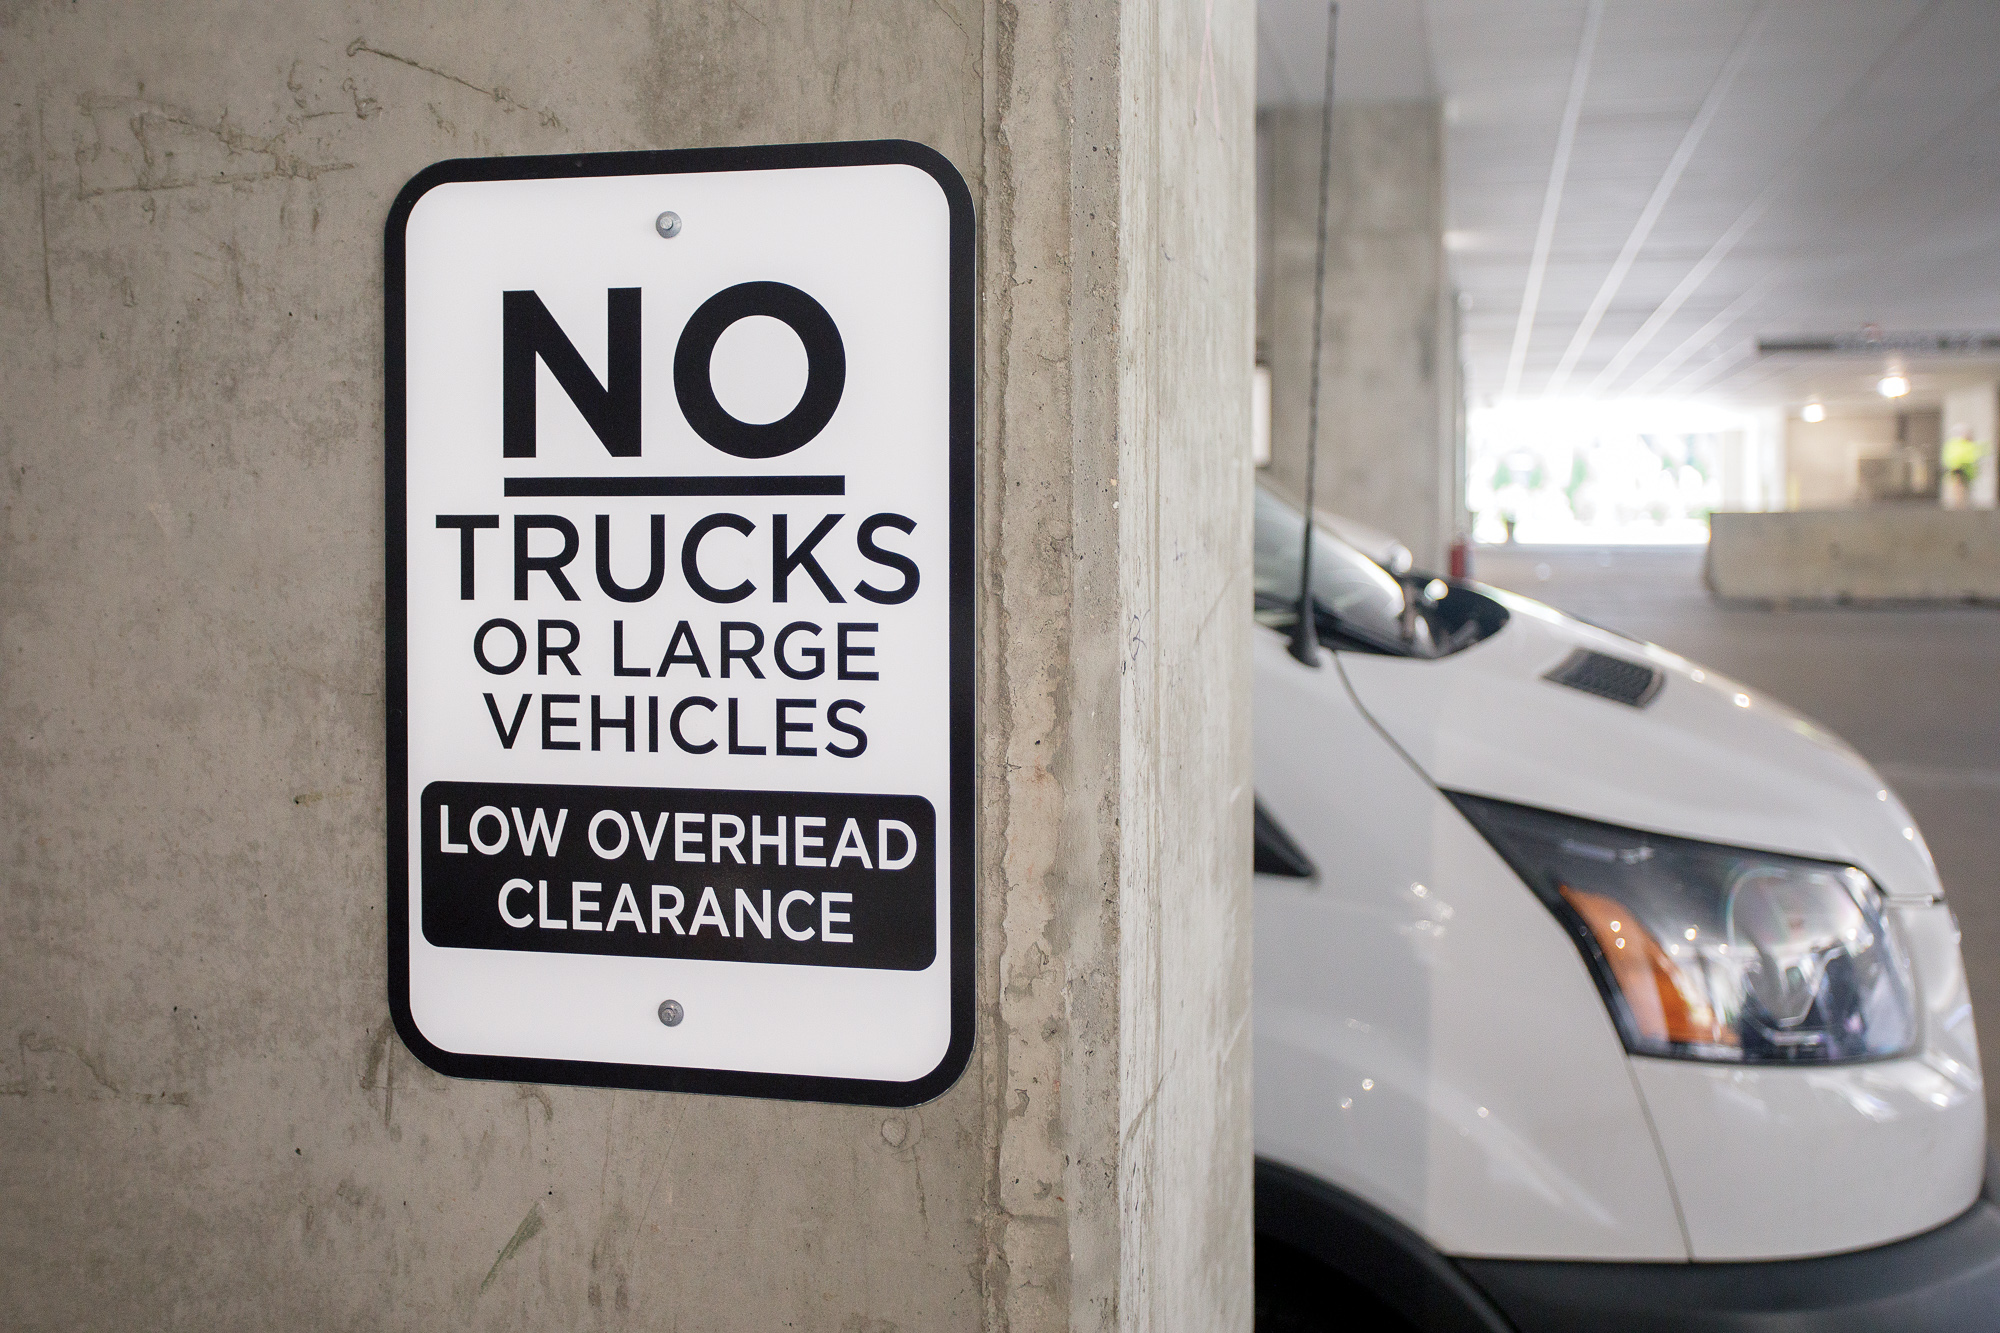 Vertis-Green-Hills_wayfinding-signage_parking-garage-no-trucks_MG_5243_small 2000 px.jpg